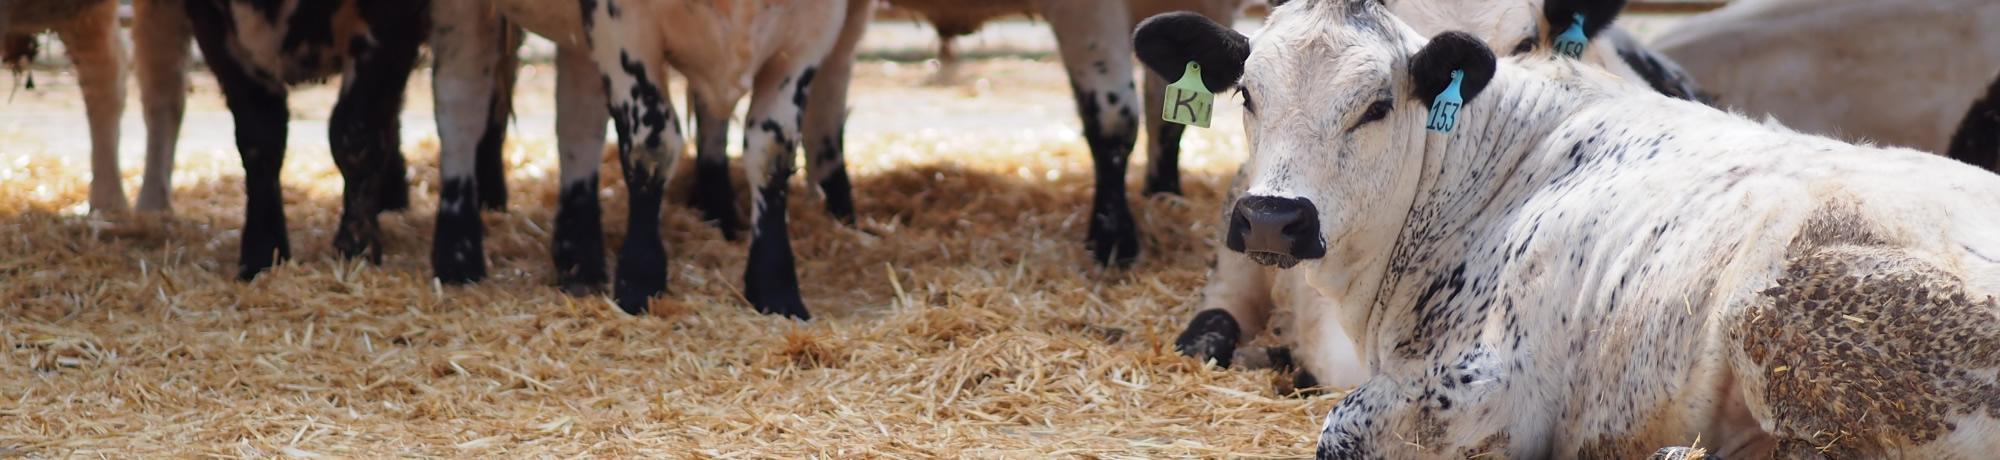 Beef Cattle Facilities | UC Davis Department of Animal Science